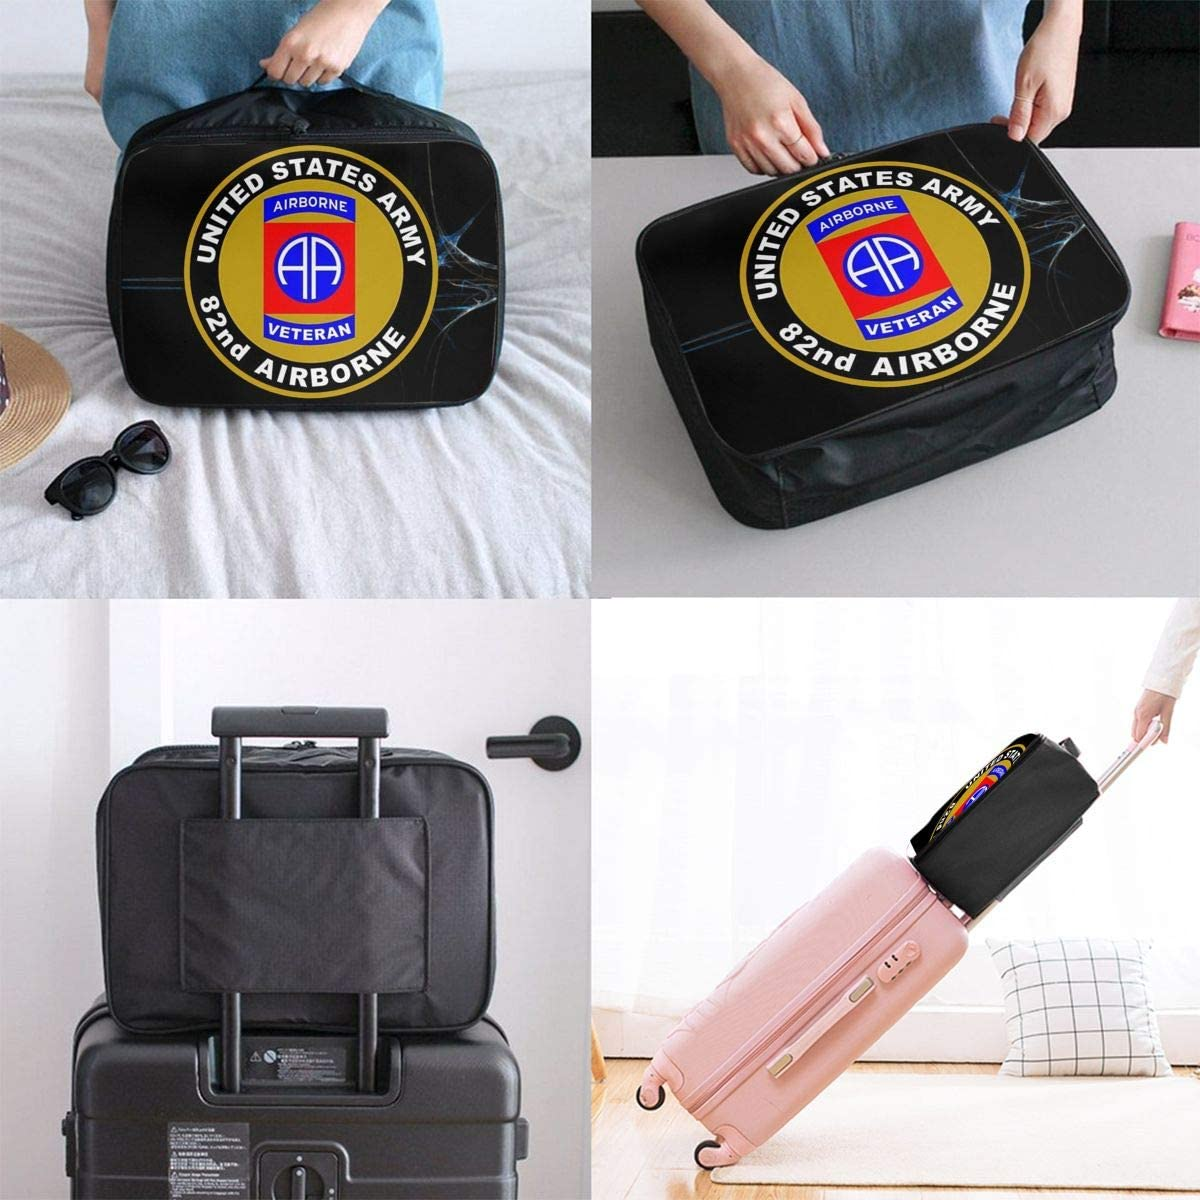 Unisex Travel Duffel Bag Waterproof Fashion Lightweight Large Capacity Portable Luggage Bag US Army Veteran 82nd Airborne